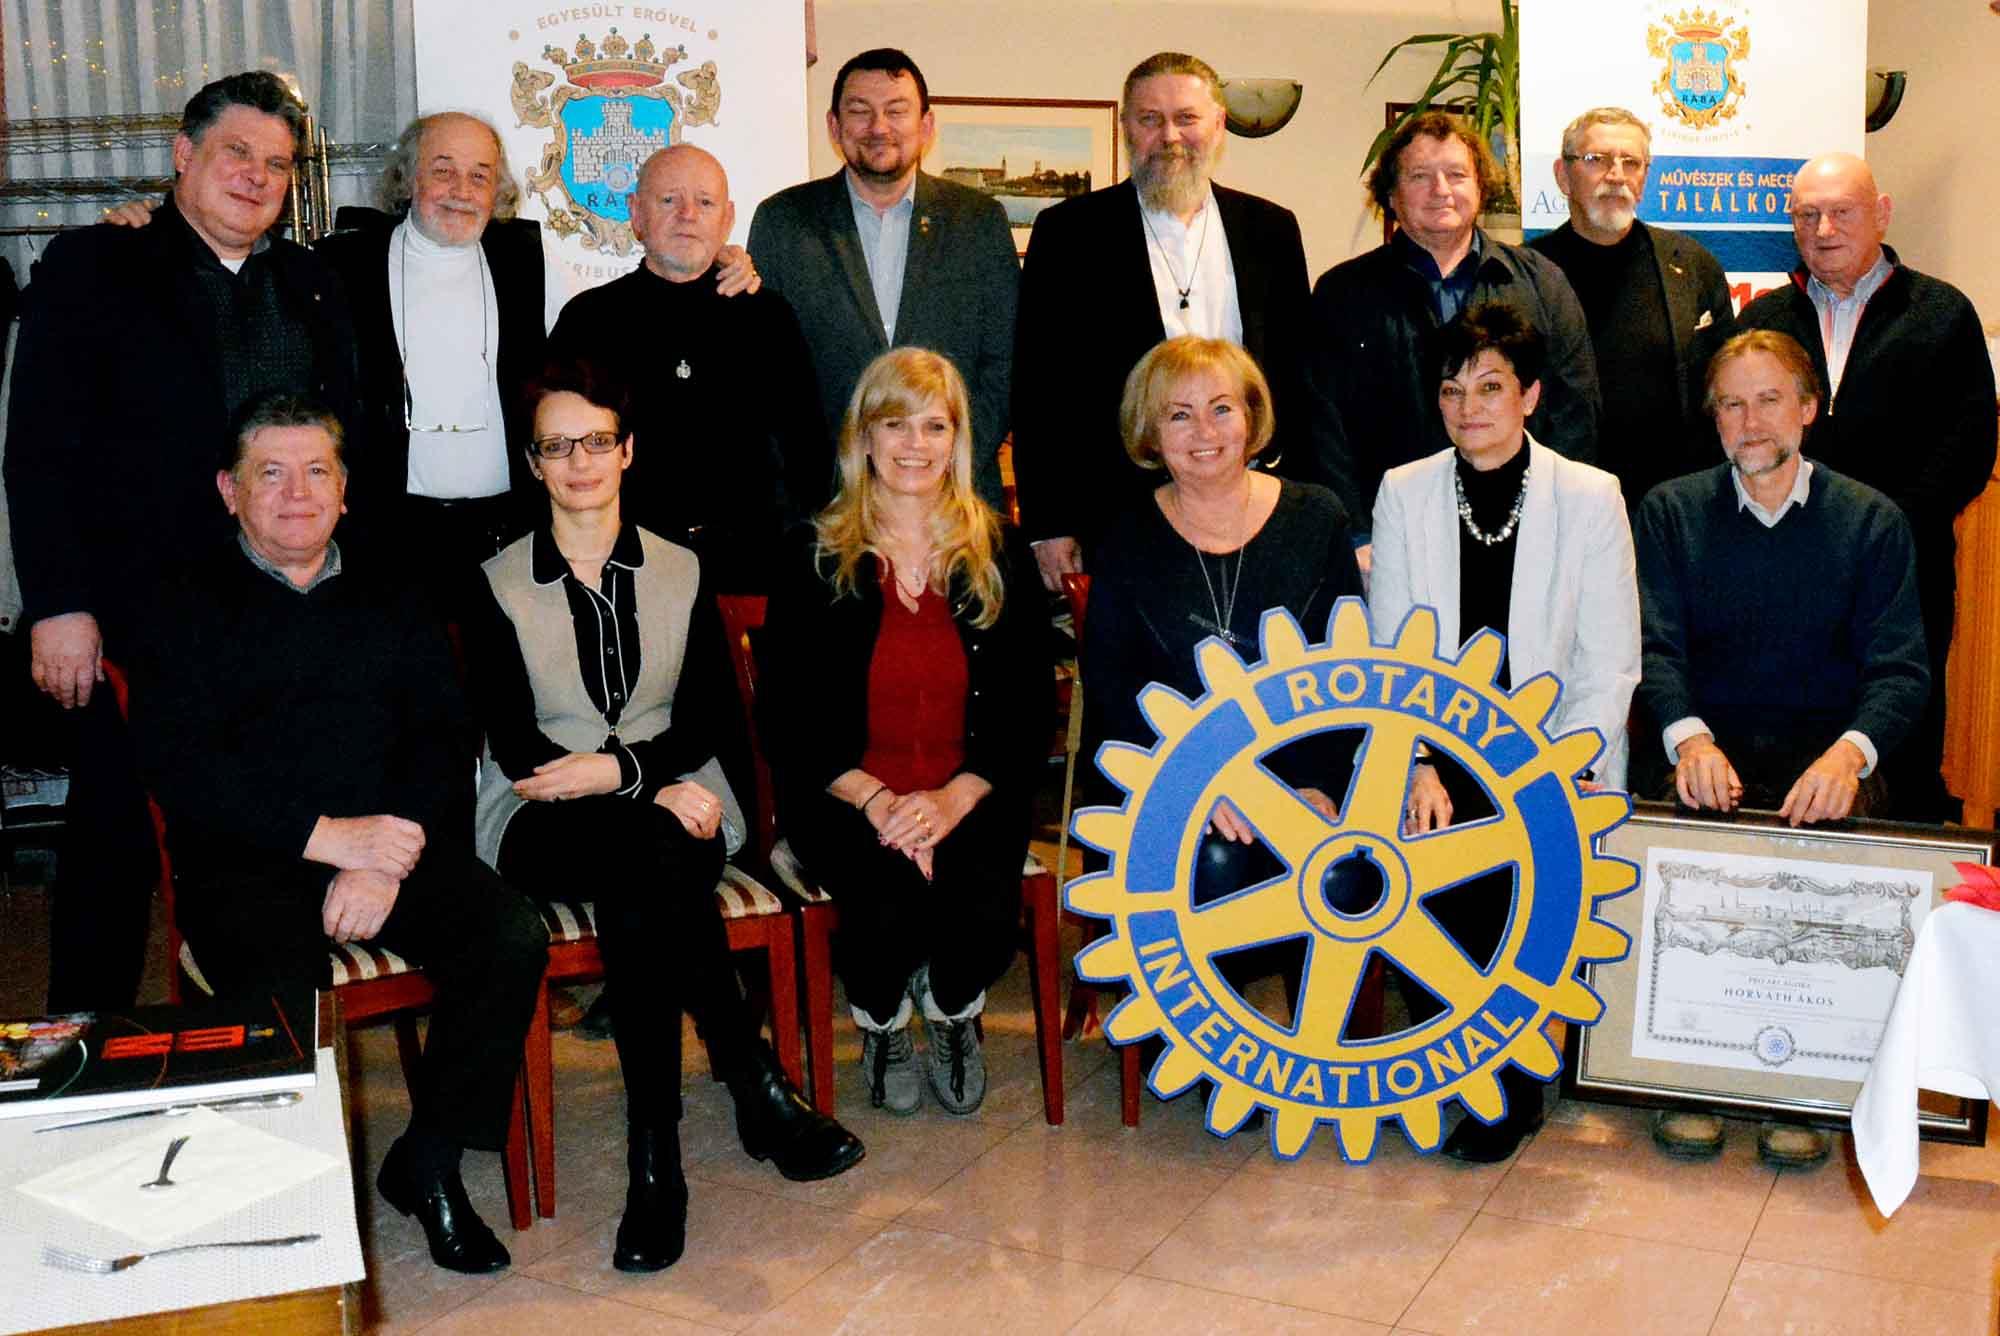 d82582a765 Rotary Club Győr-Rába 27